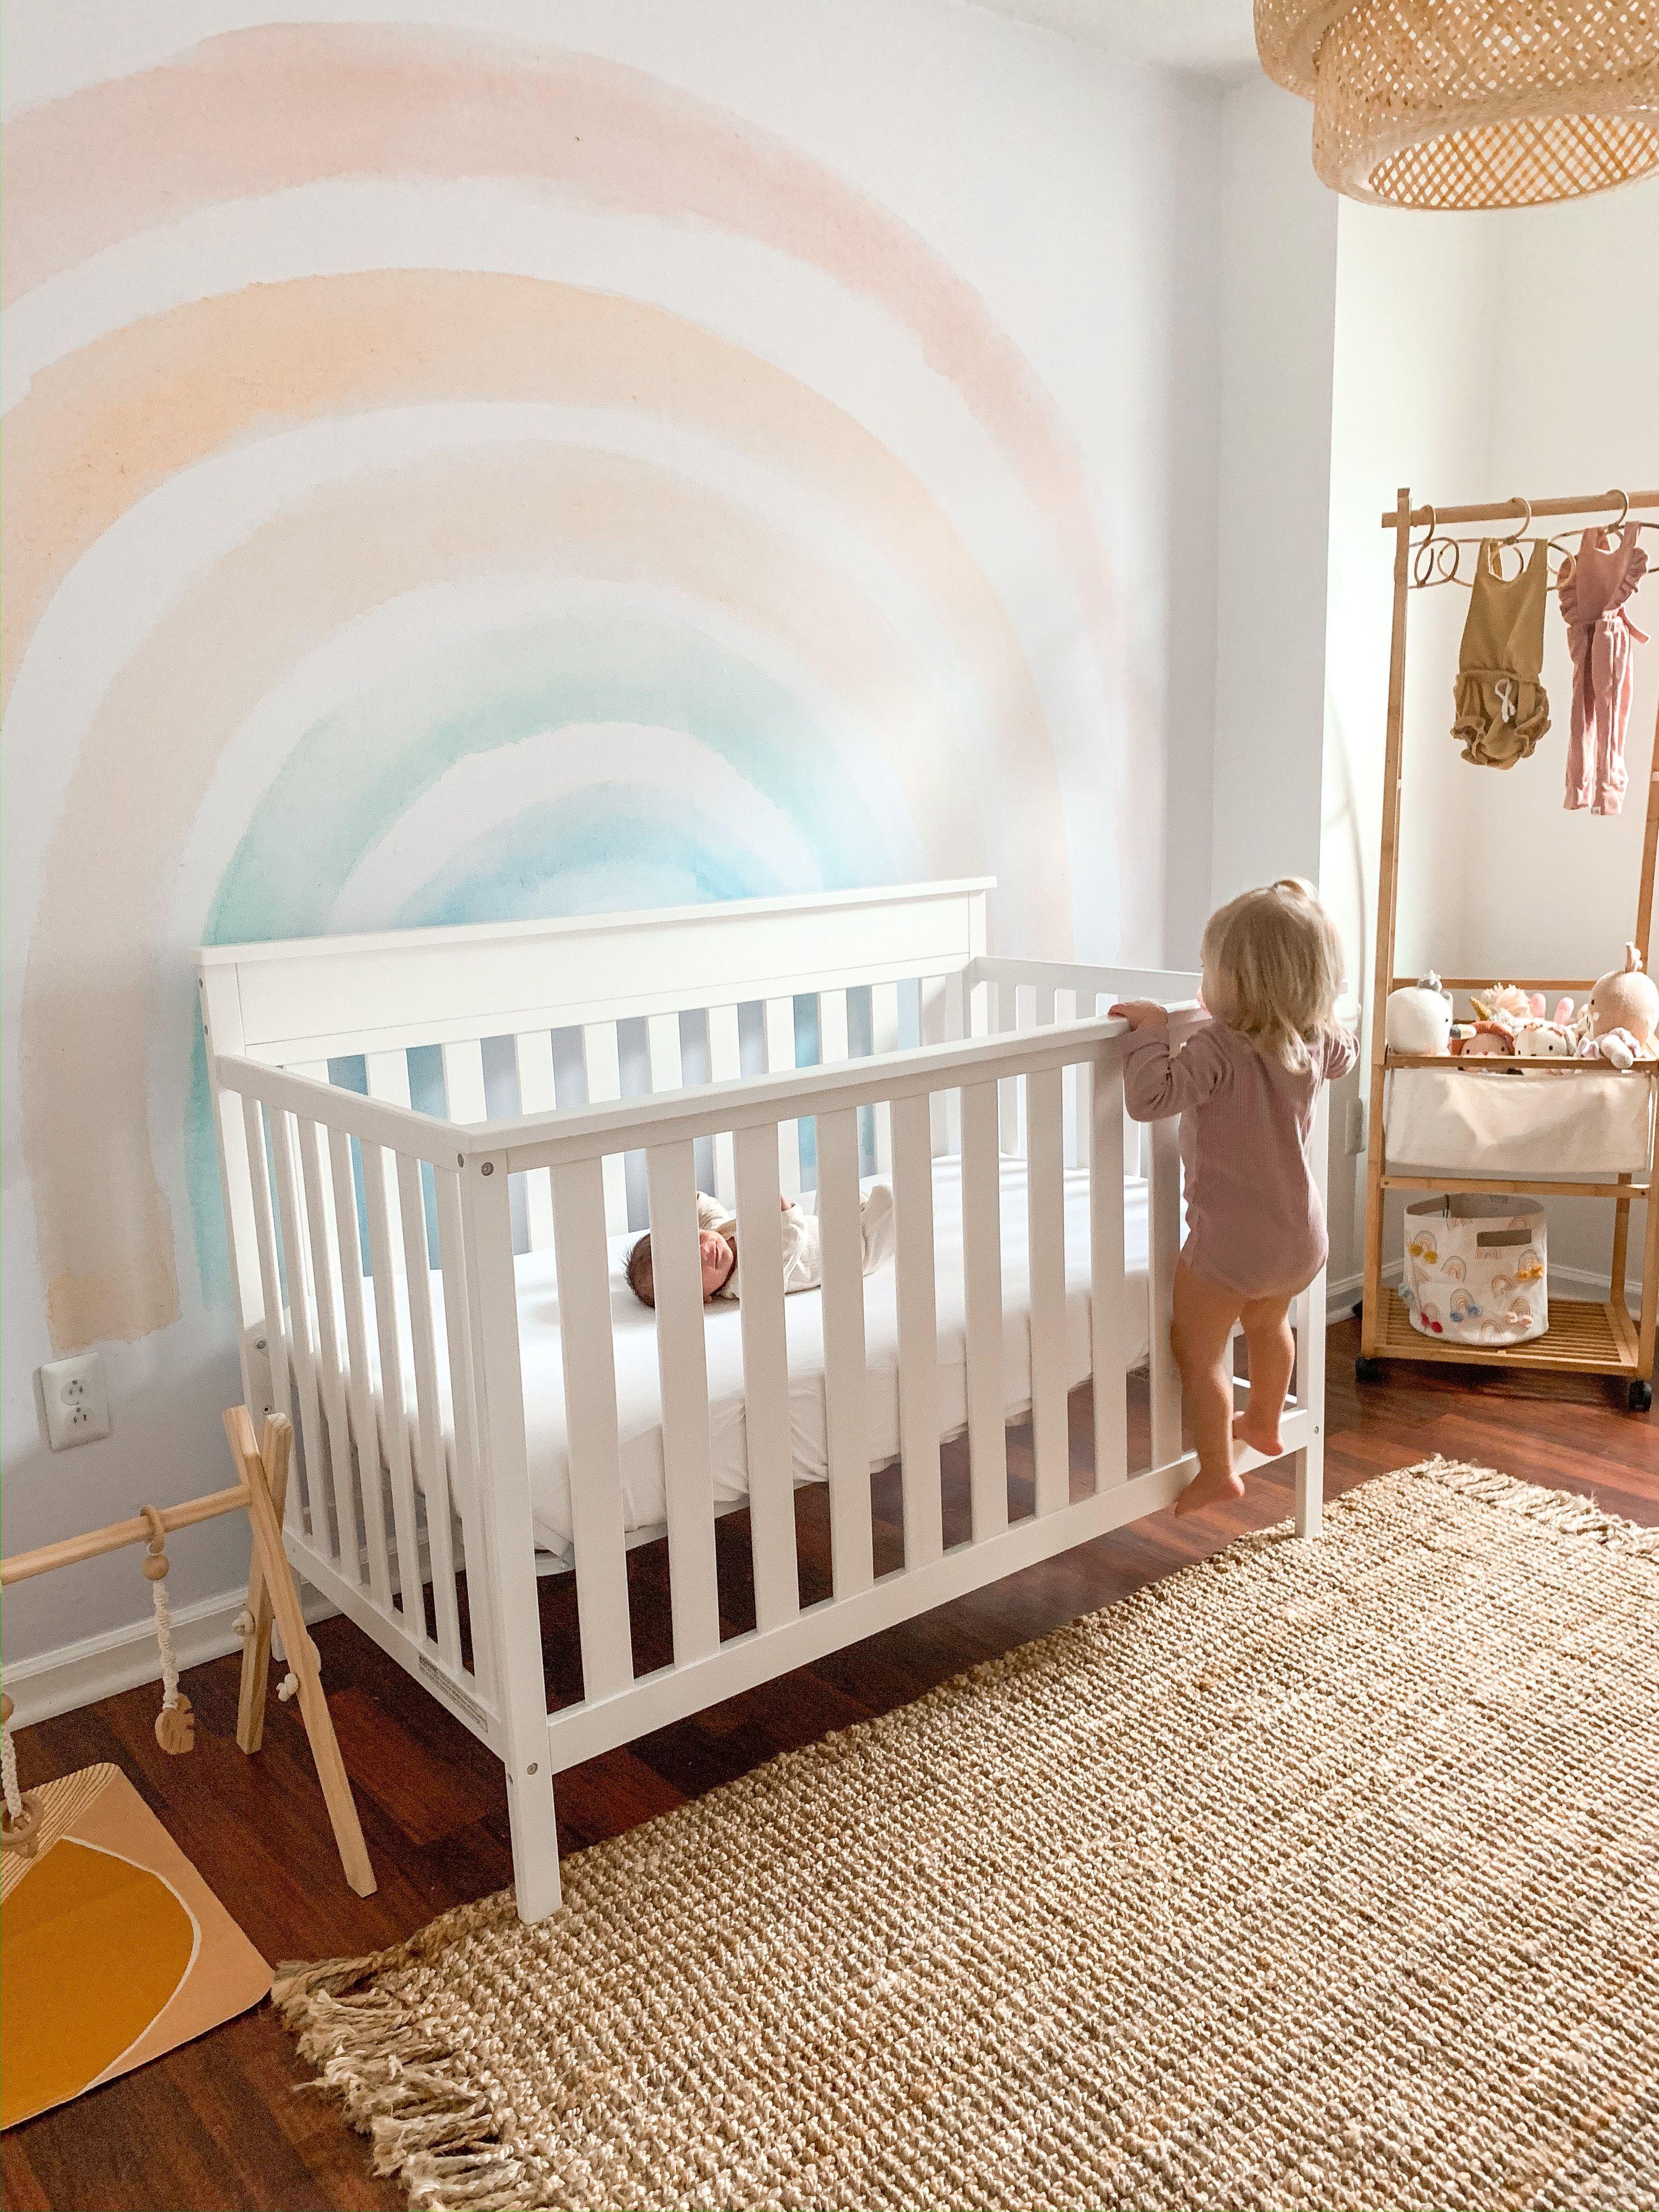 Bohemian Rainbow Wallpaper in 2020 Minimalist baby room